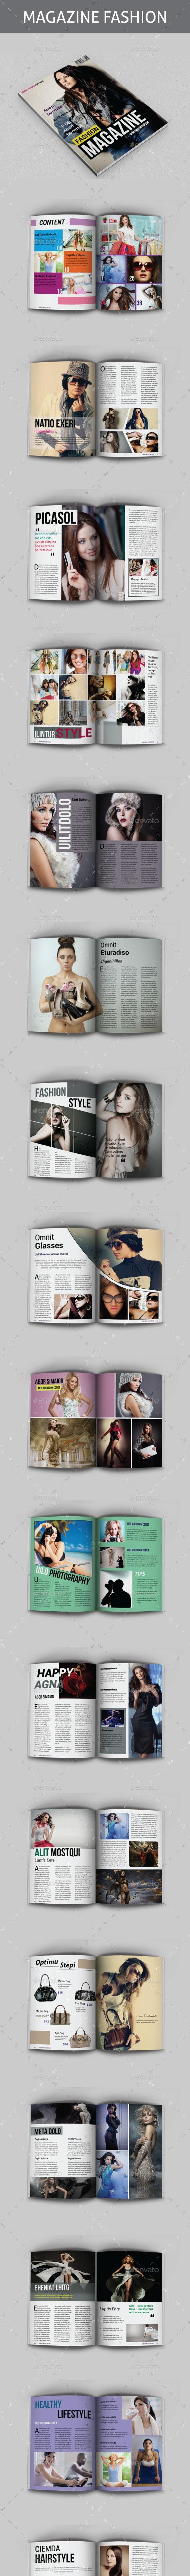 Fashion Magazine Templates - Magazines Print Templates